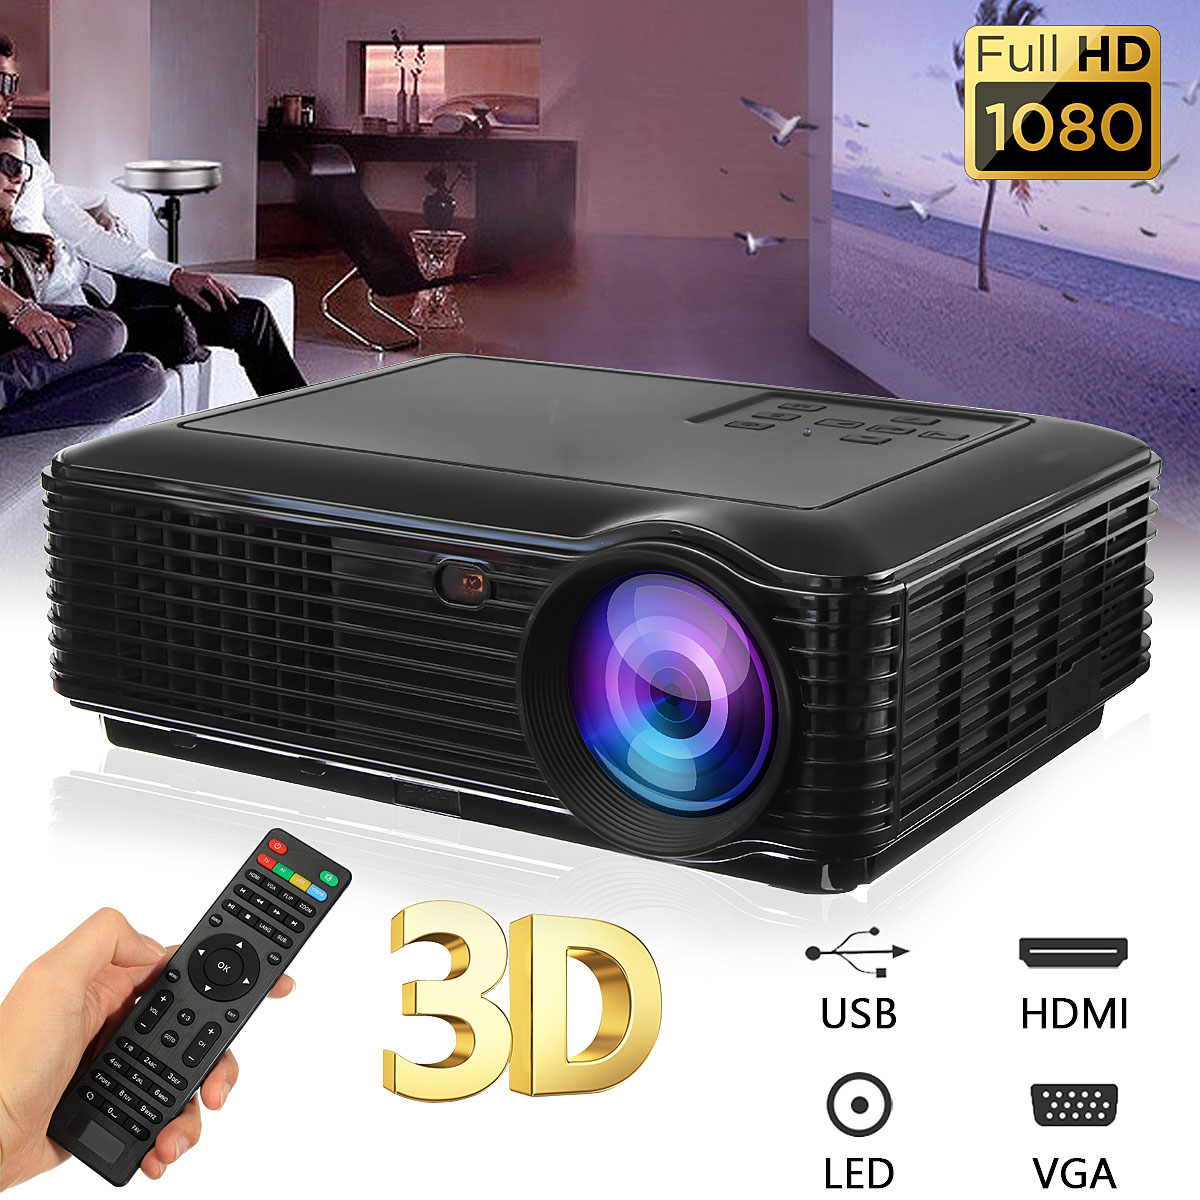 SV-228 1080P LED Mini Portable Projector 1280x800 HDMI USB AV SD  330 Lumens  Digital HD Home Theater Projector